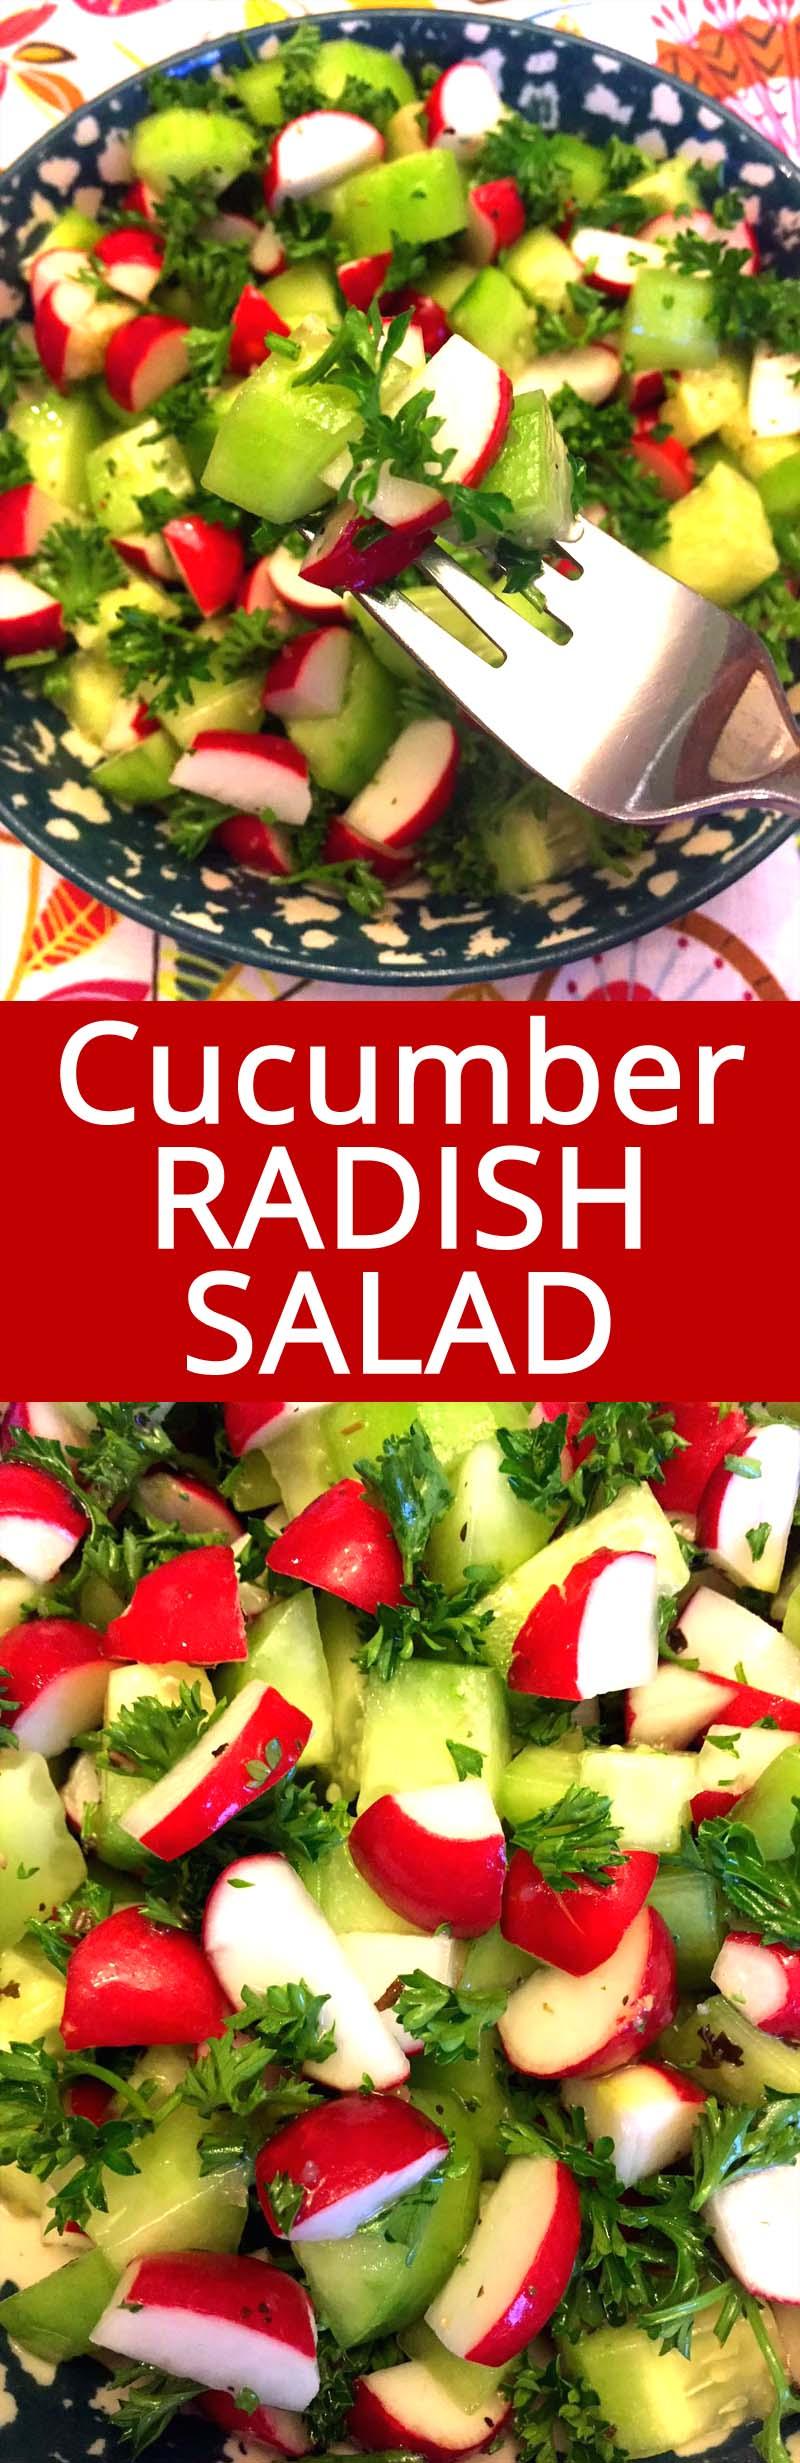 I love this cucumber radish salad! So healthy, crunchy and refreshing! YUM YUM YUM!